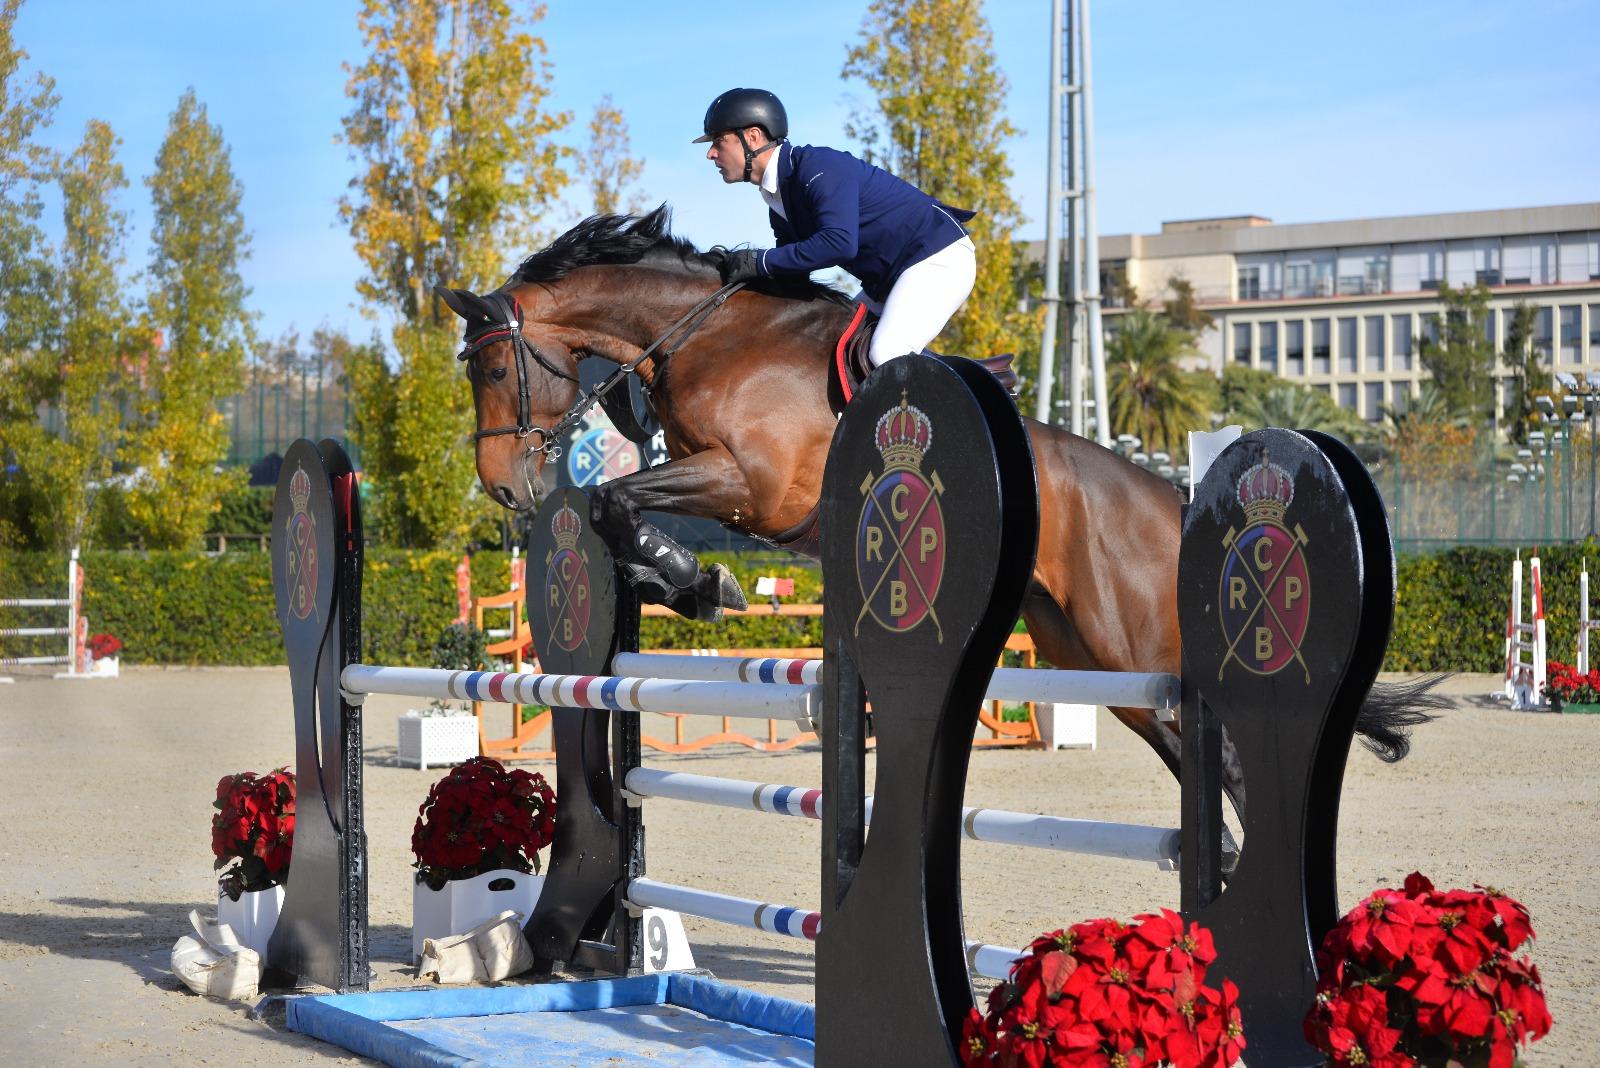 horse-breeding-stable-internationnal-horse-jump-9